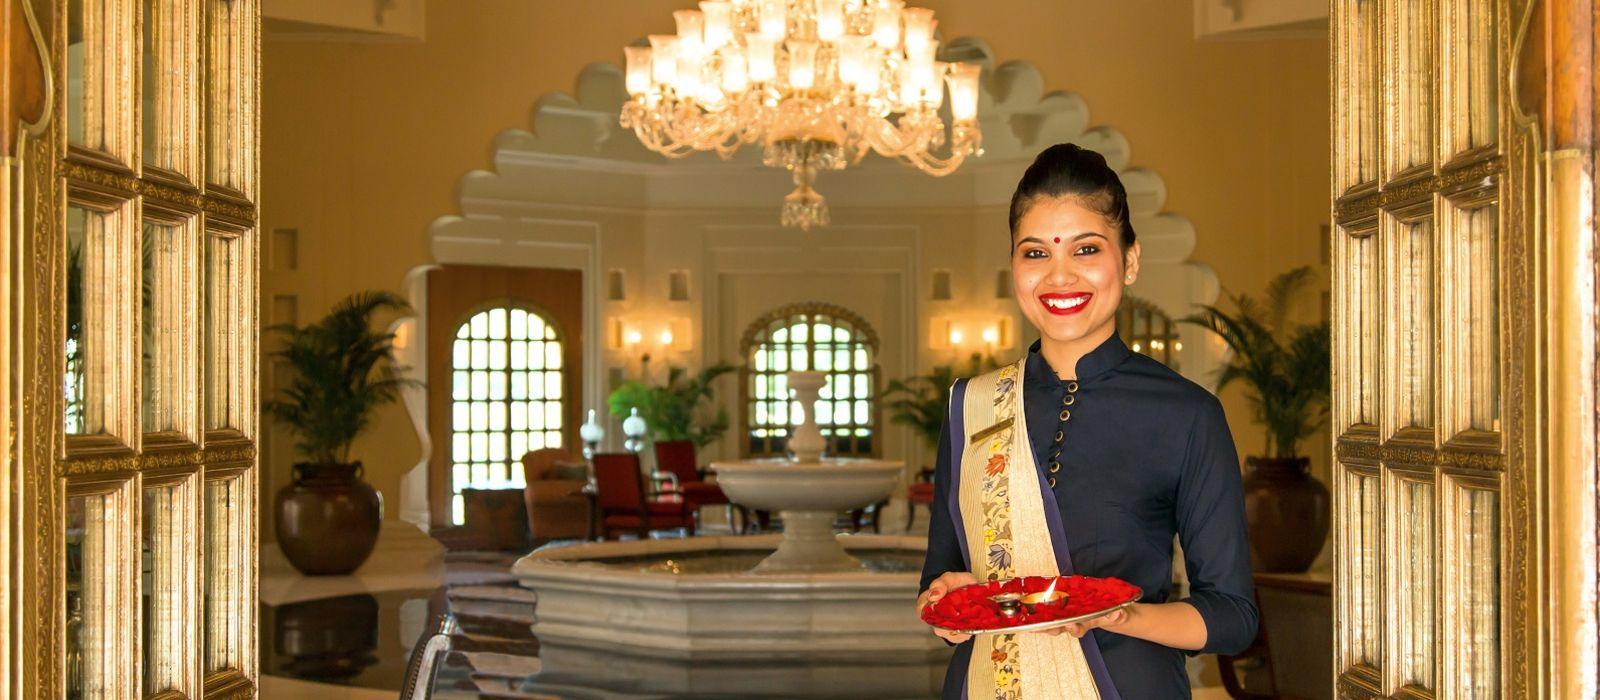 Oberoi Exklusiv: Royales Rajasthan und Safari Abenteuer Urlaub 8